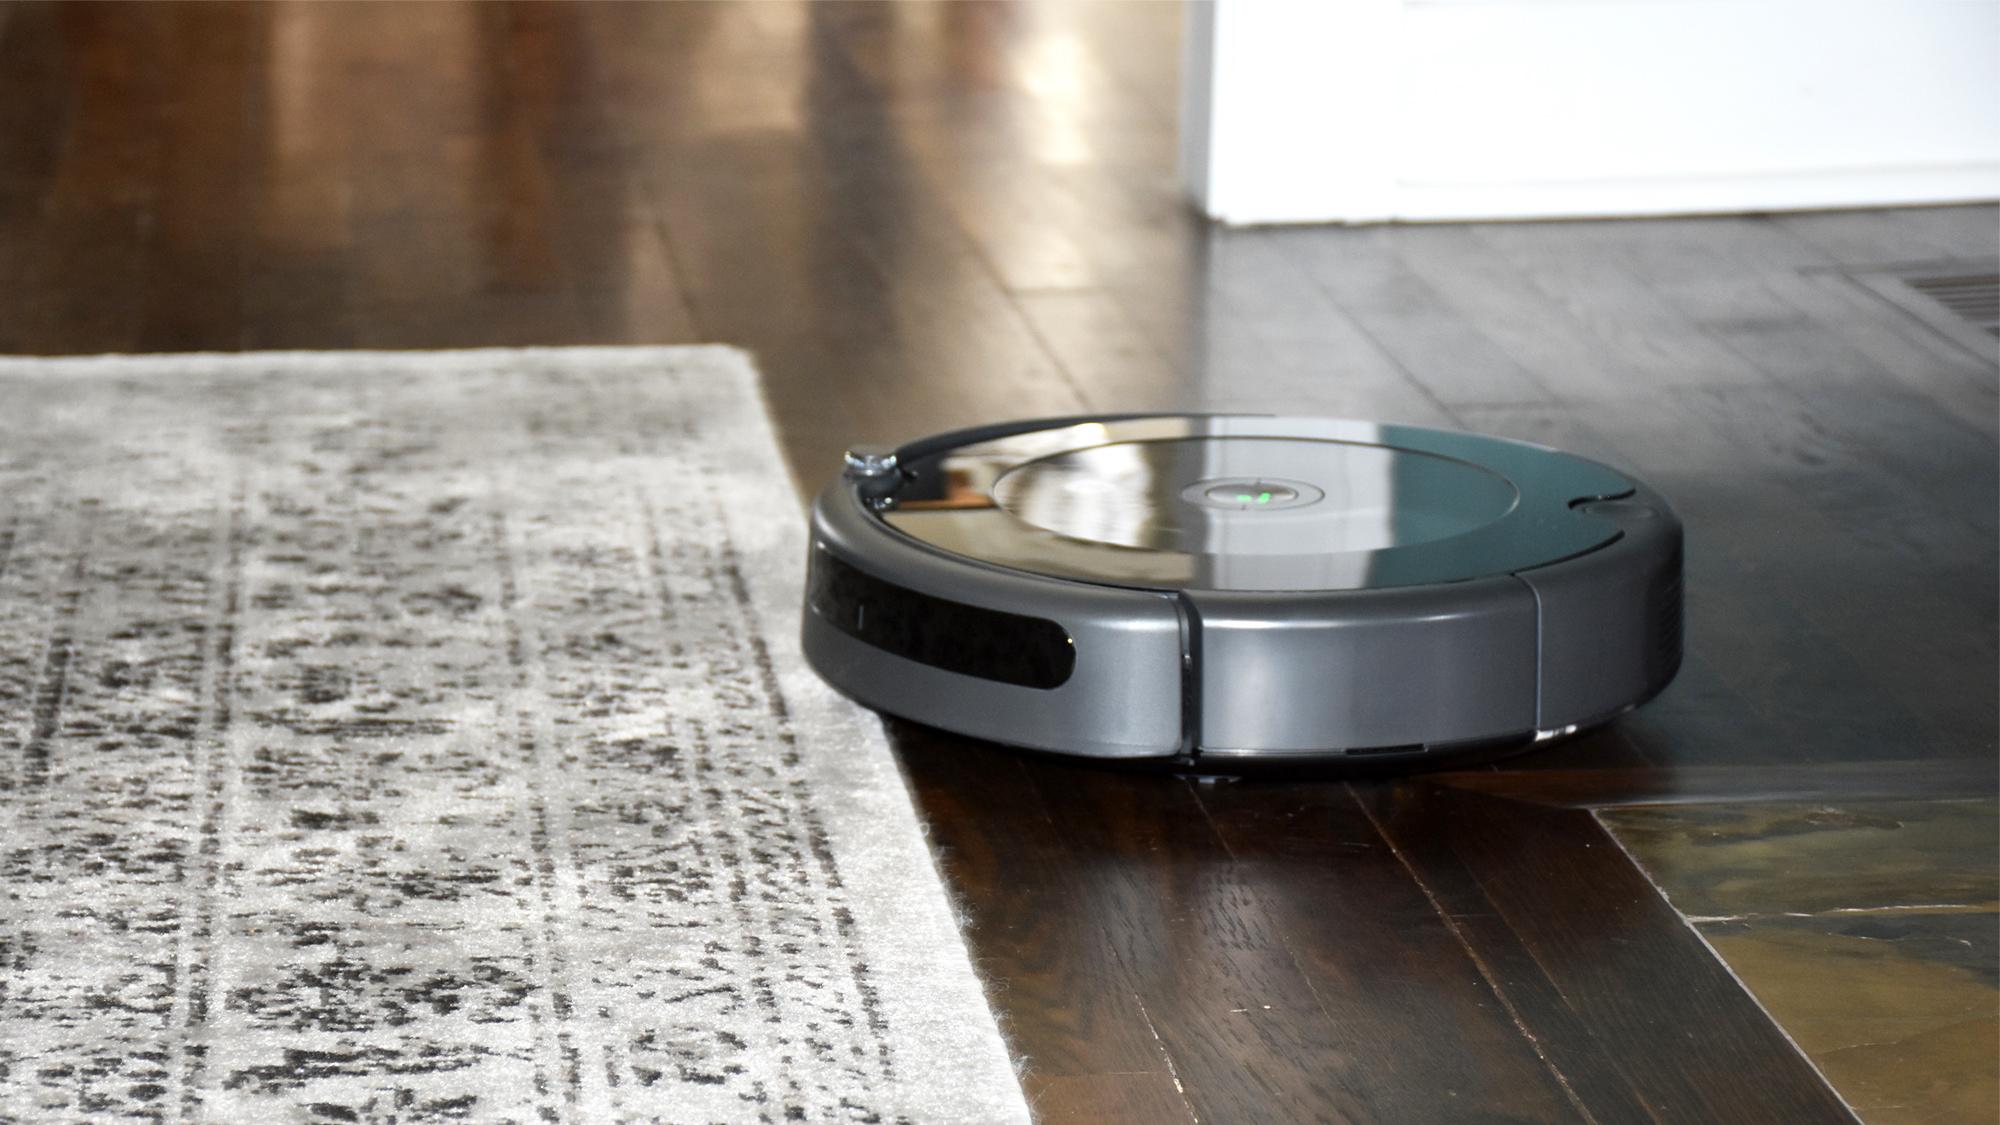 iRobot Roomba 694 robot vacuum review | Tom's Guide